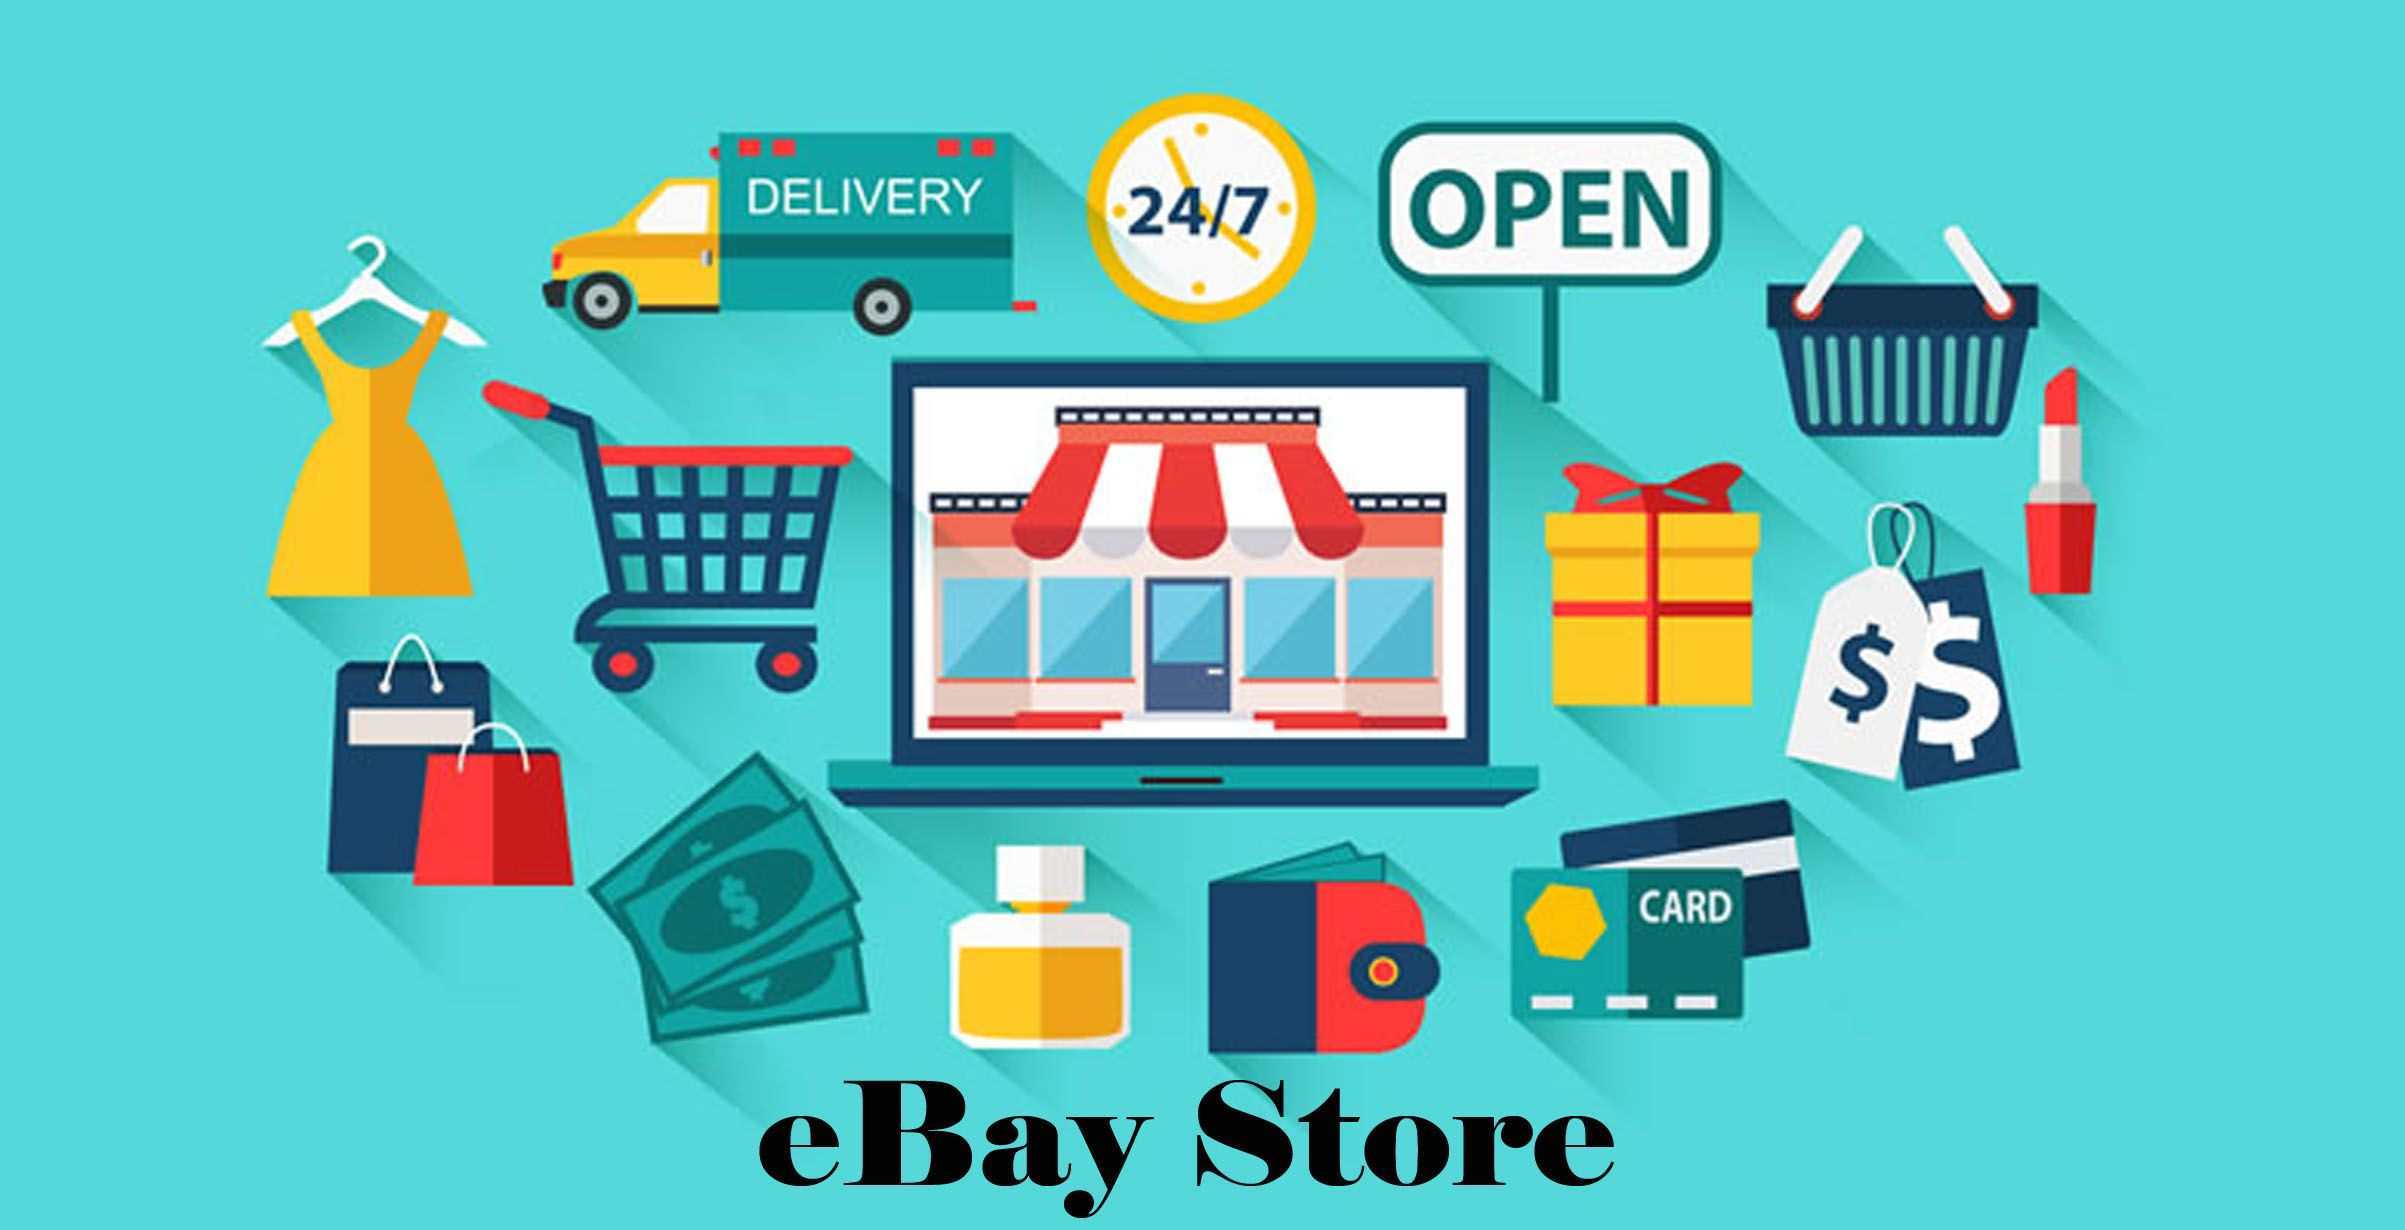 Ebay Store Ebay Store Open Ebay Store Fees Makeover Arena Ebay Store Design Ebay Store Woocommerce